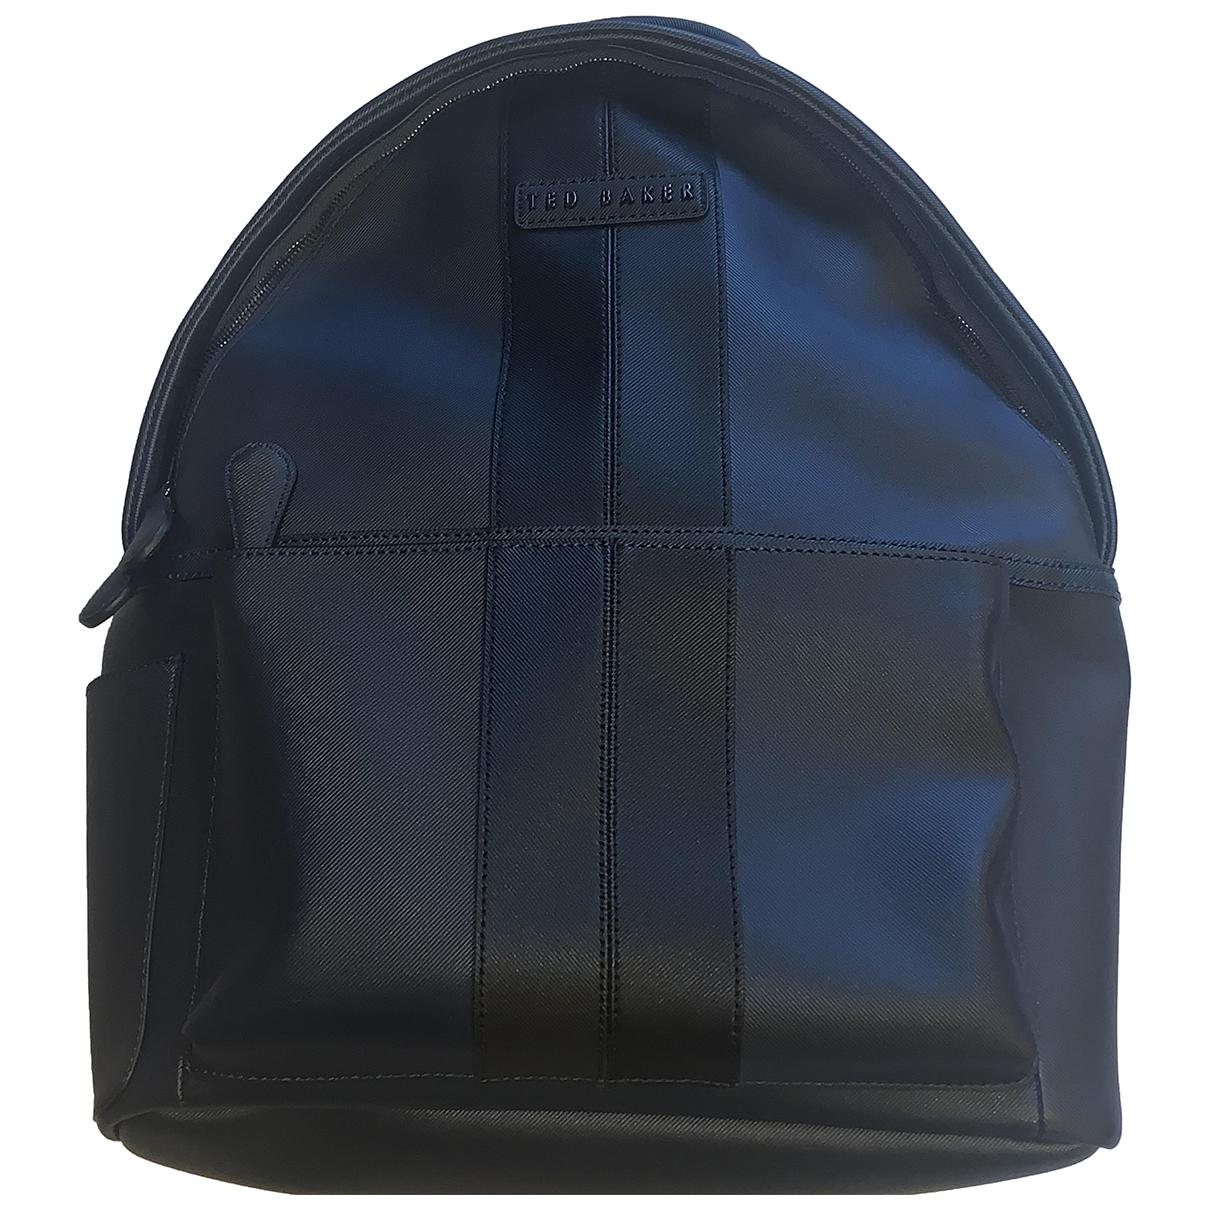 Ted Baker \N Navy bag for Men \N